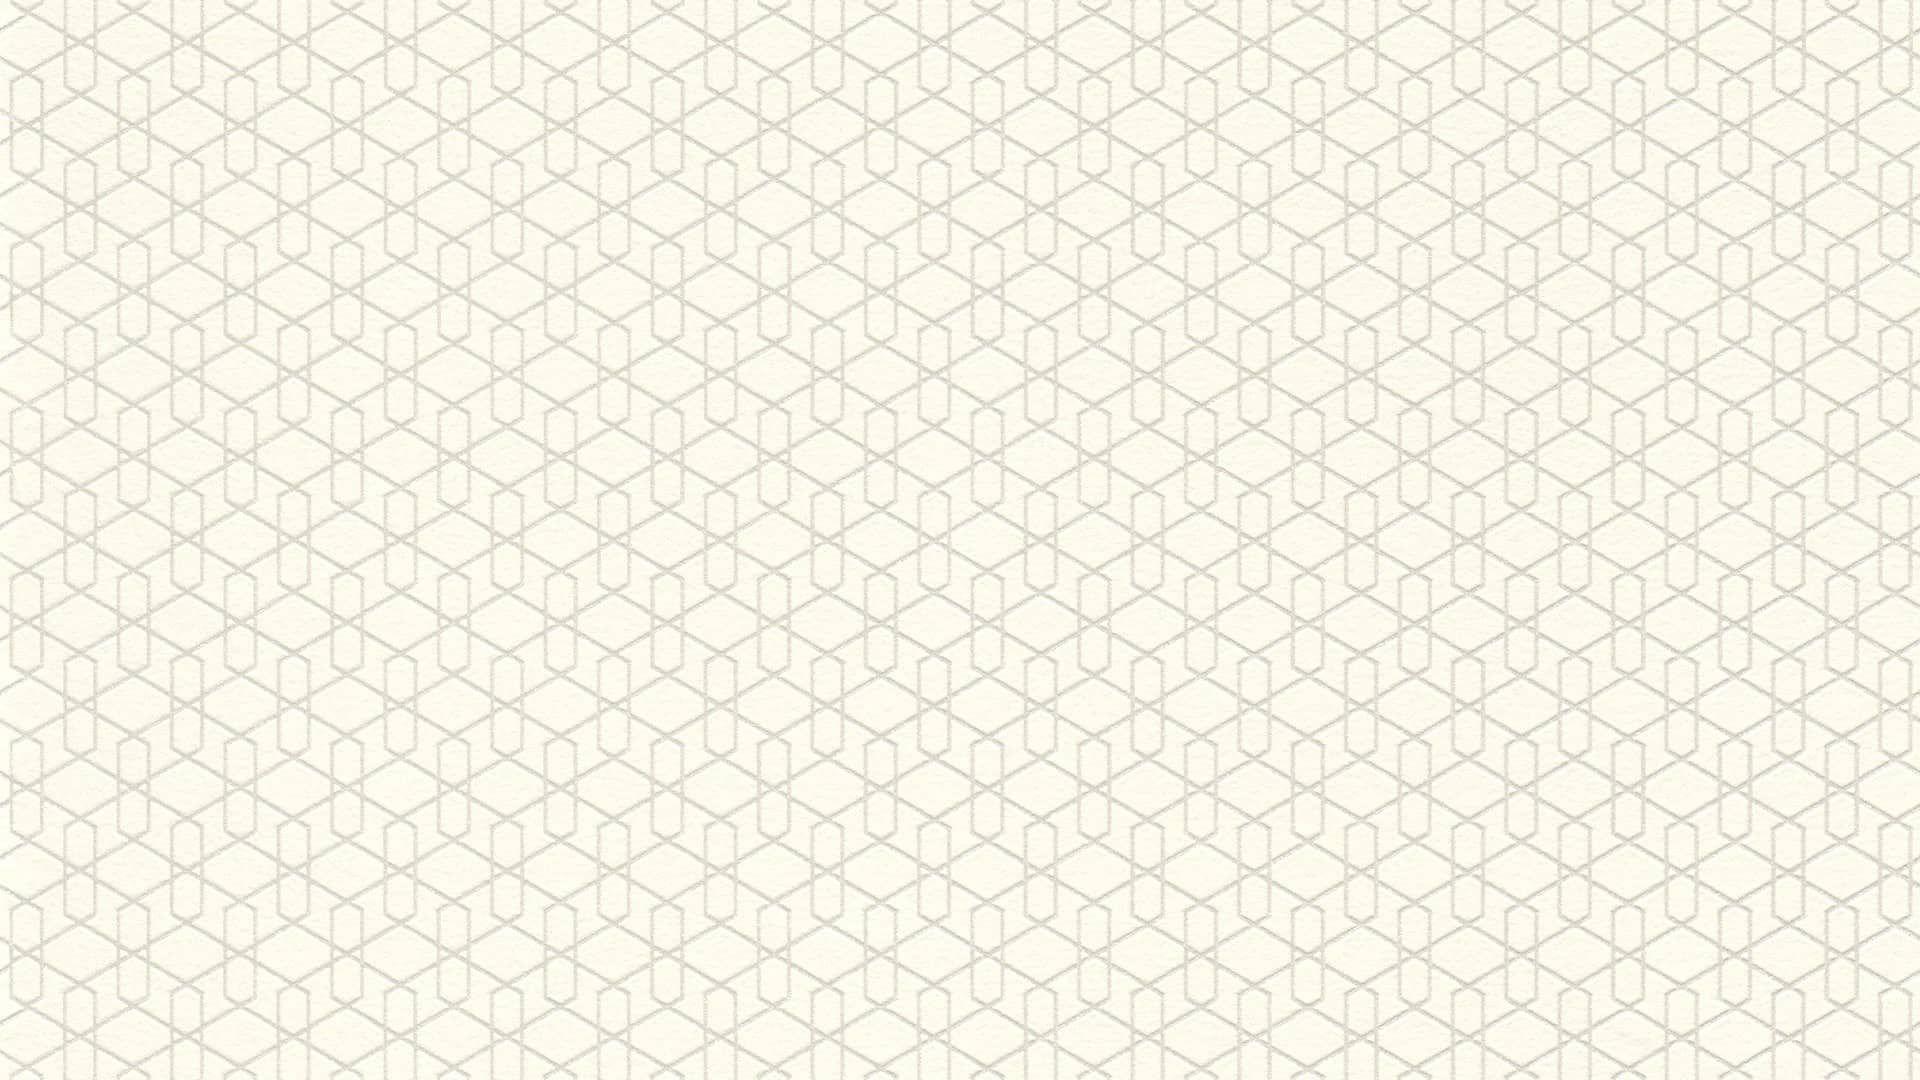 Website Background Texture wallpaper free